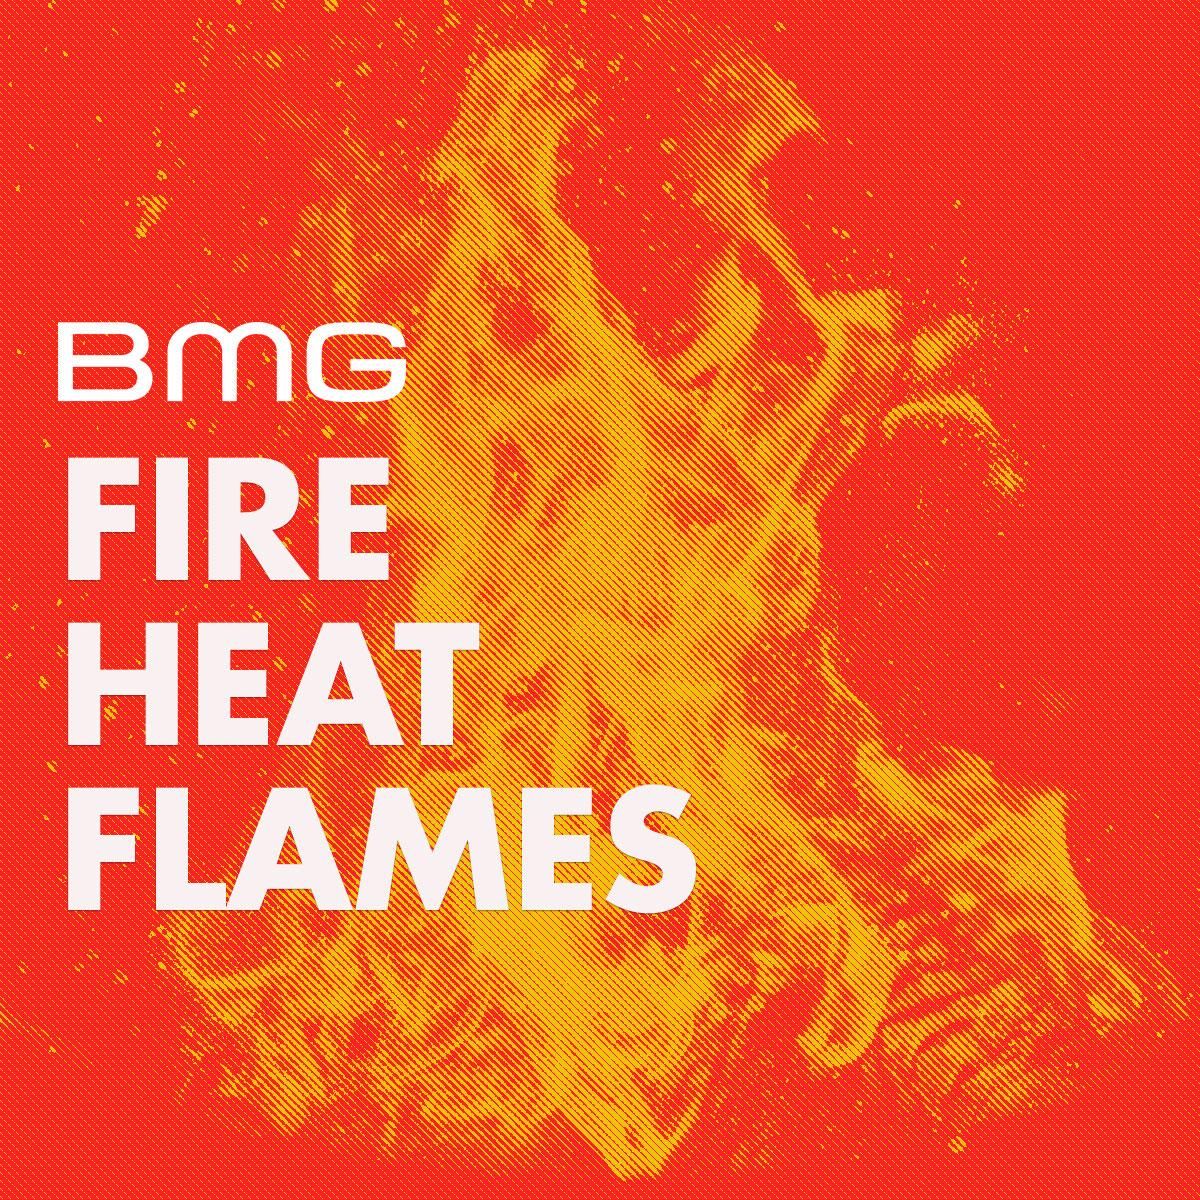 1200-x-1200-FIRE-HEAT-FLAMES.jpg